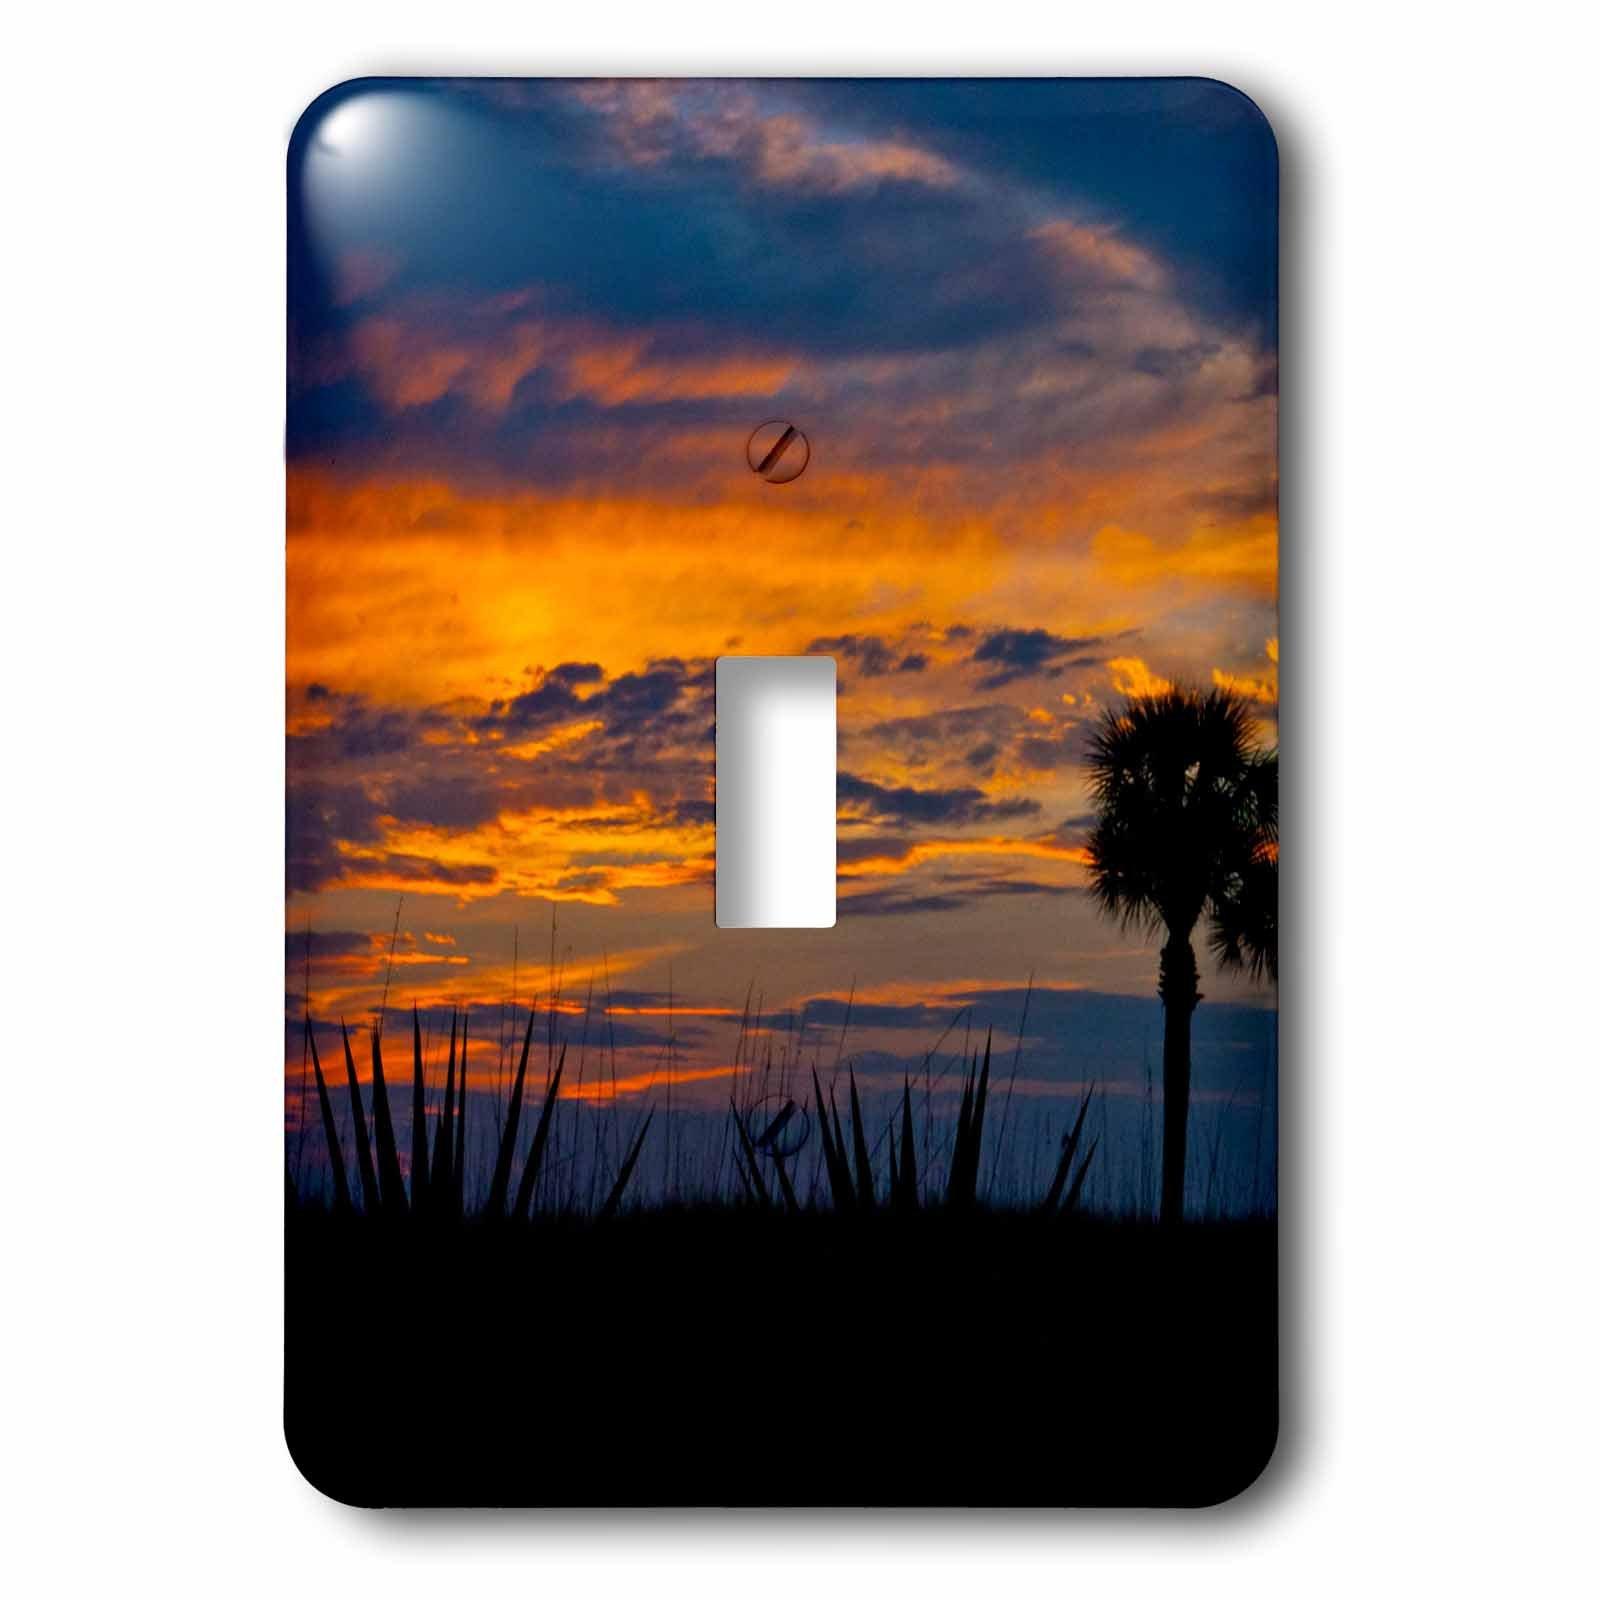 3dRose LSP_259165_1 USA, Florida, Sarasota, Crescent Beach Siesta Key Sunset Toggle Switch, Multicolor